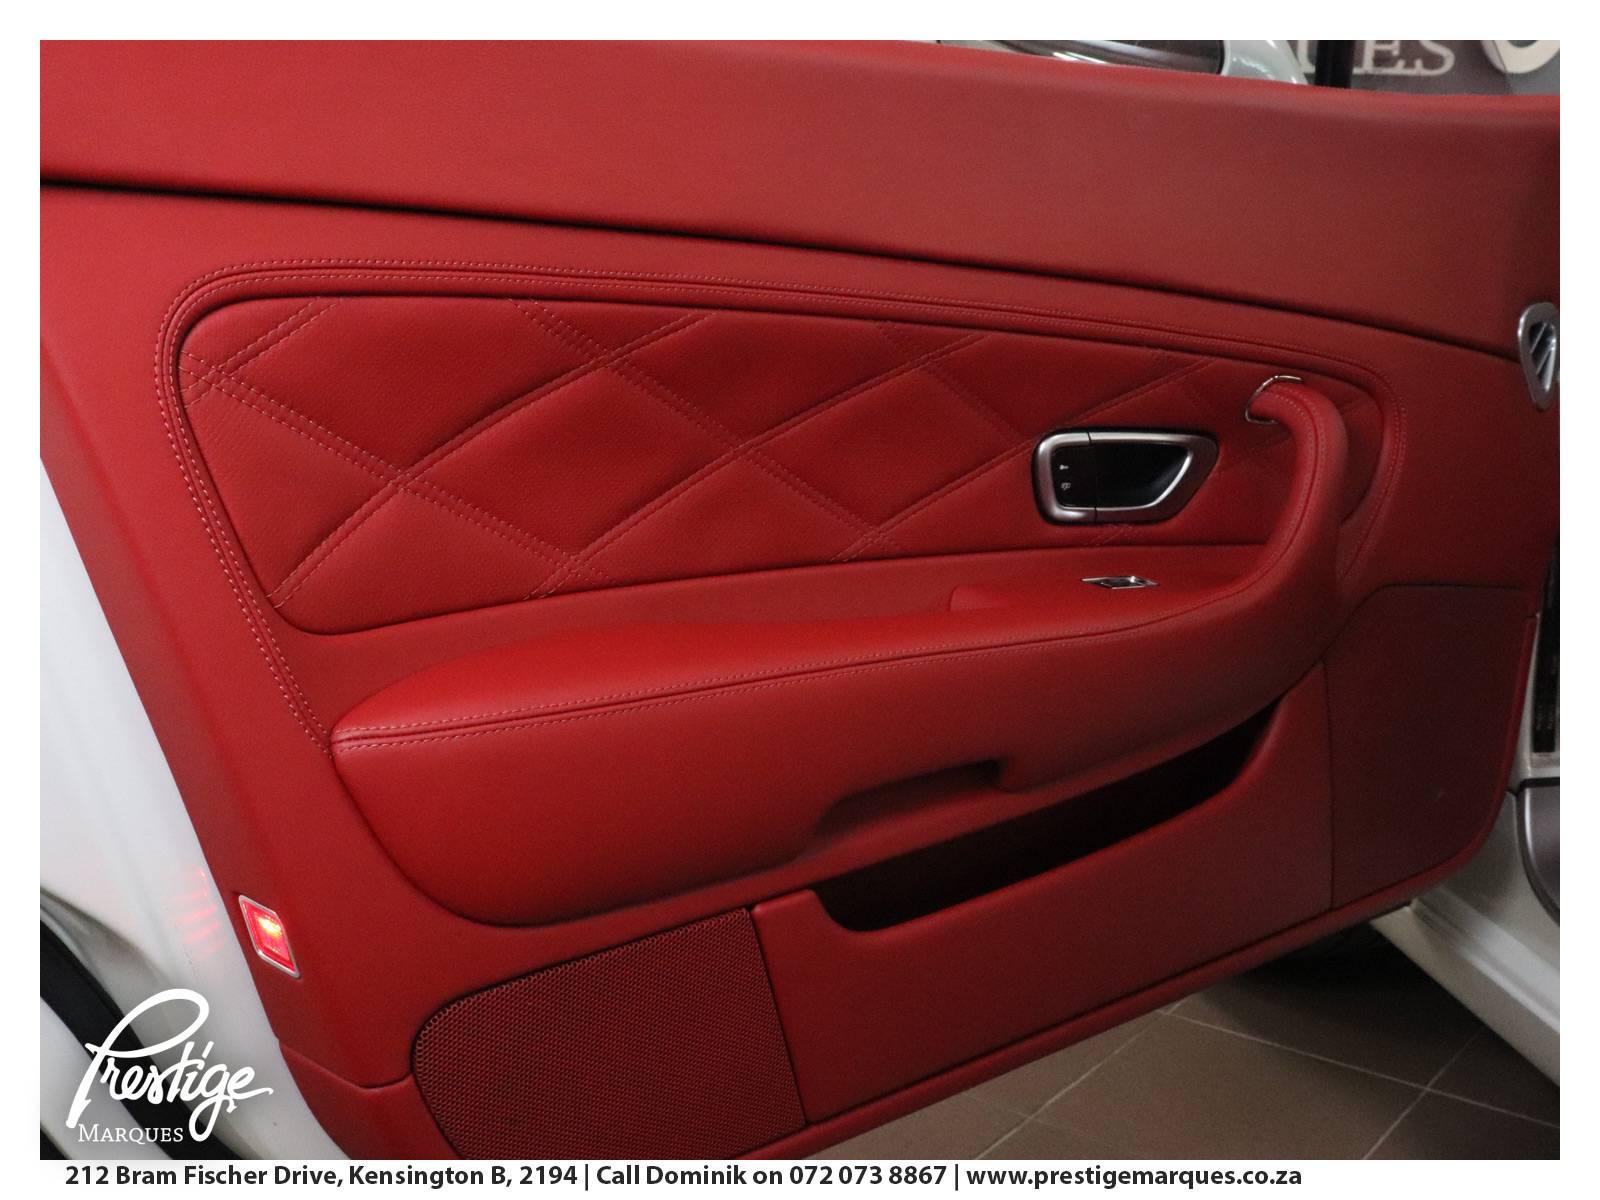 2011-Bentley-continental-Prestige-Marques-Randburg-Sandton-12